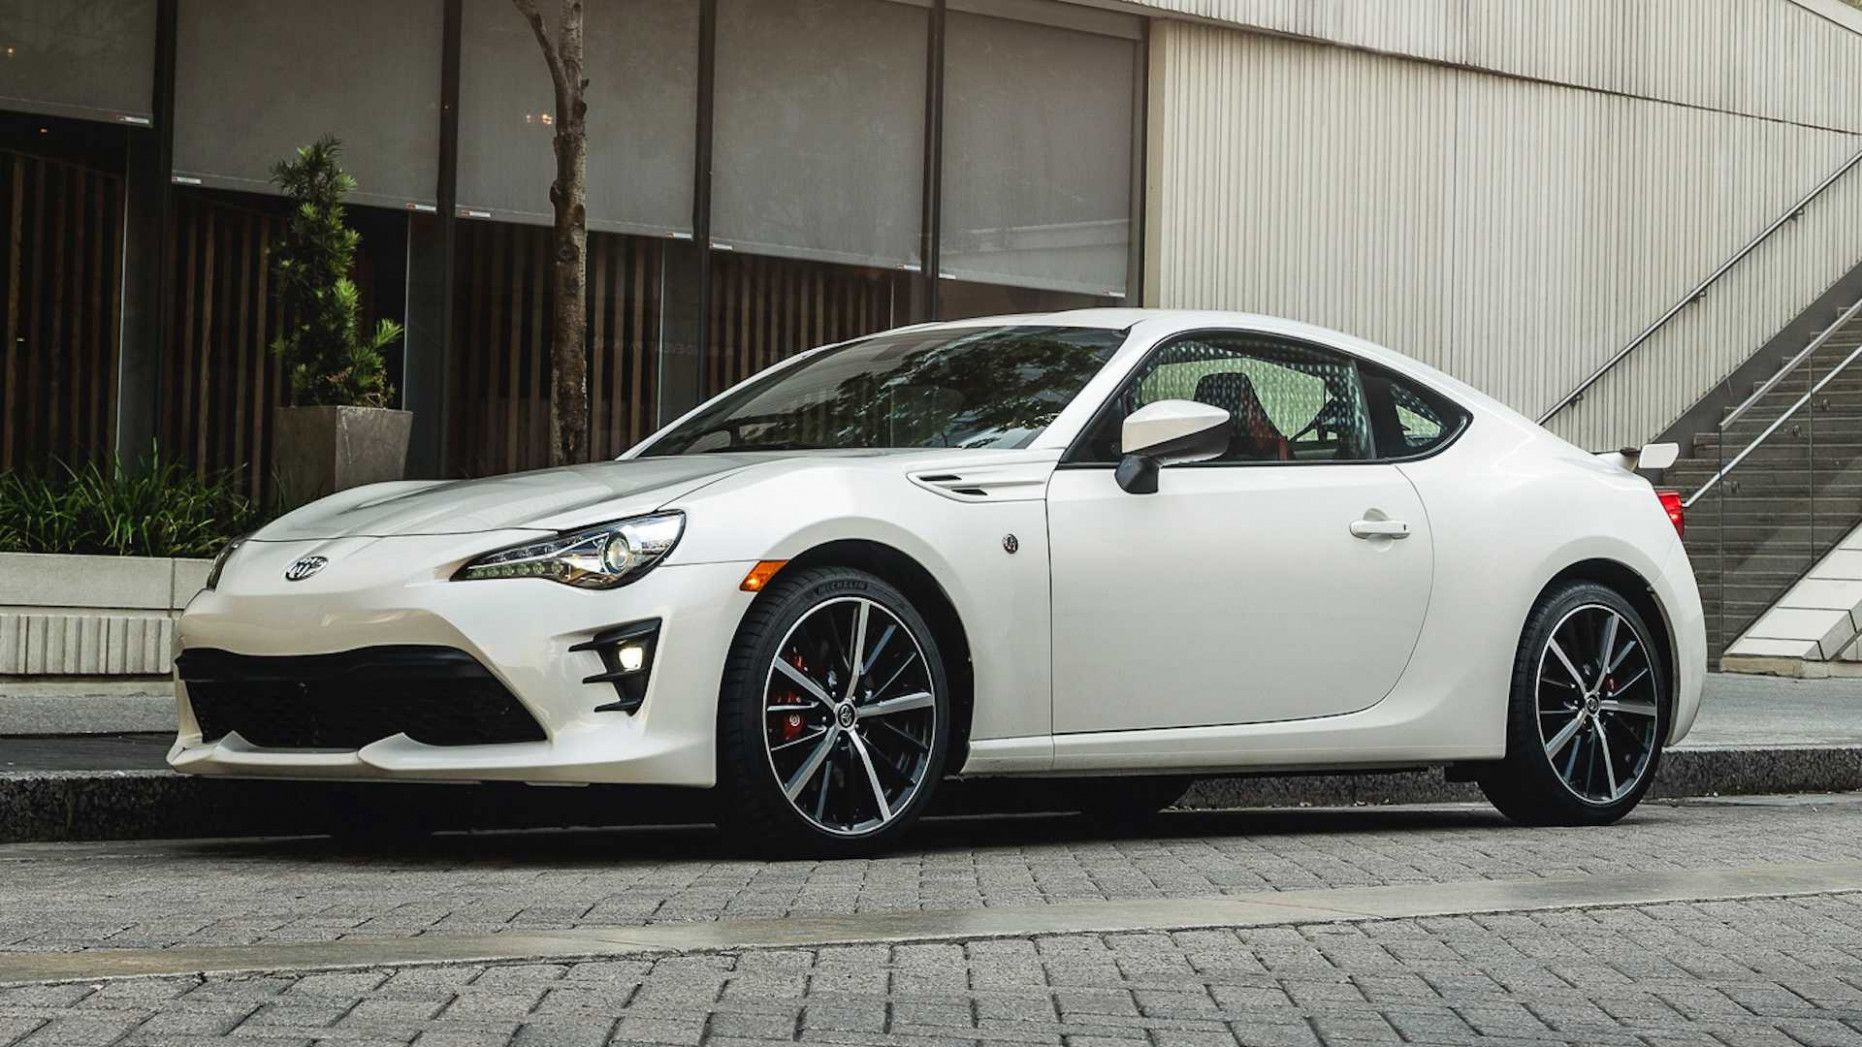 Kekurangan Toyota Gt86 Perbandingan Harga